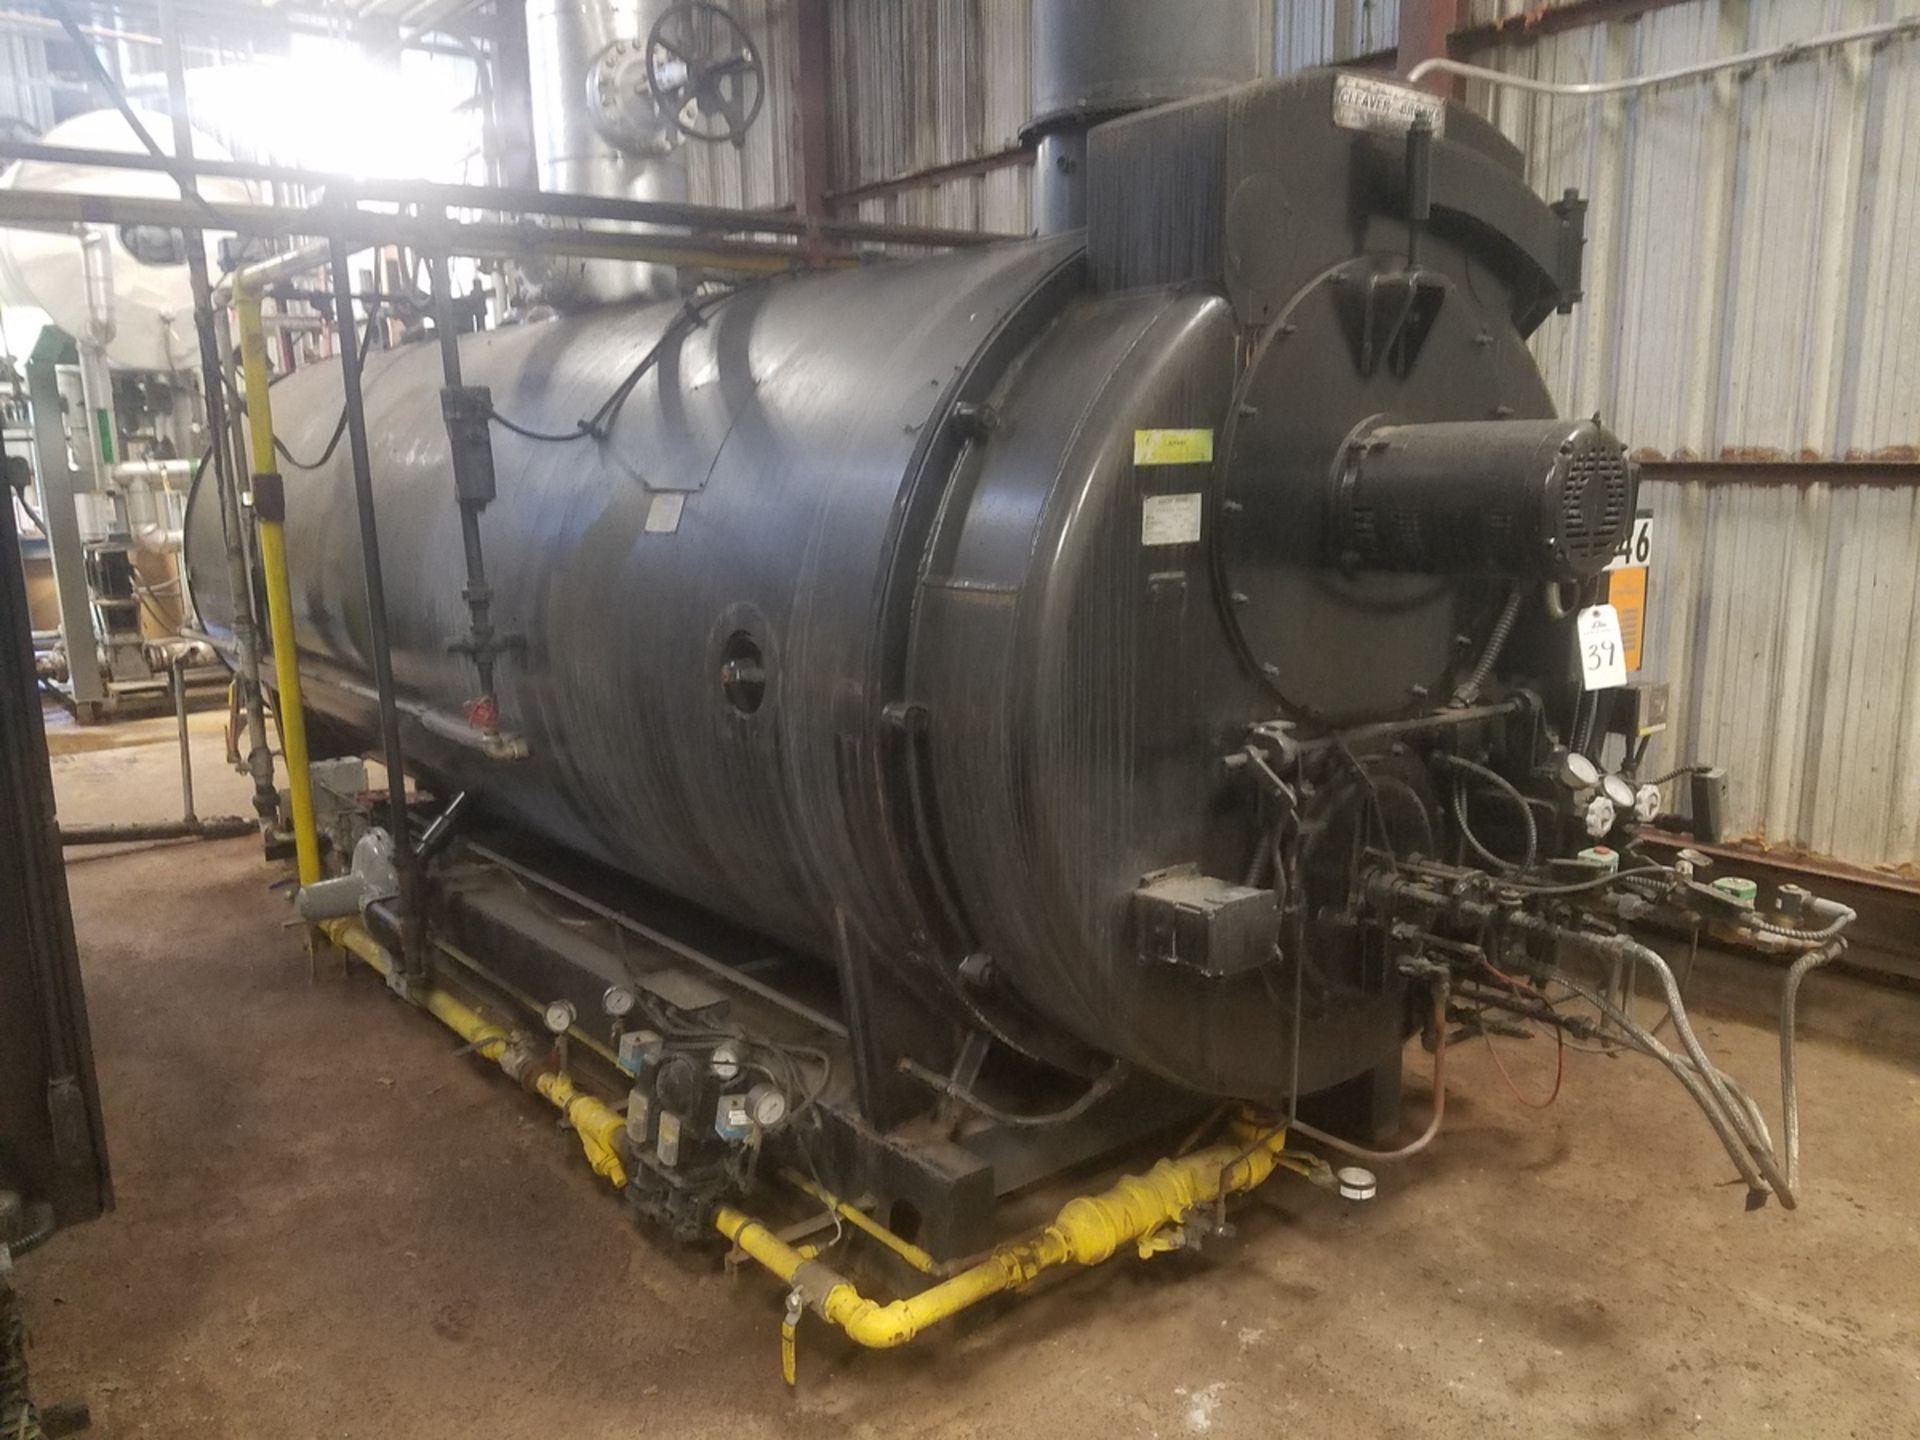 2009 (Rebuilt 2016) 250 HP Cleaver Brooks Boiler, 8.9 mmBTU, M# CB-200-250S-250, | Rig Fee: $5000